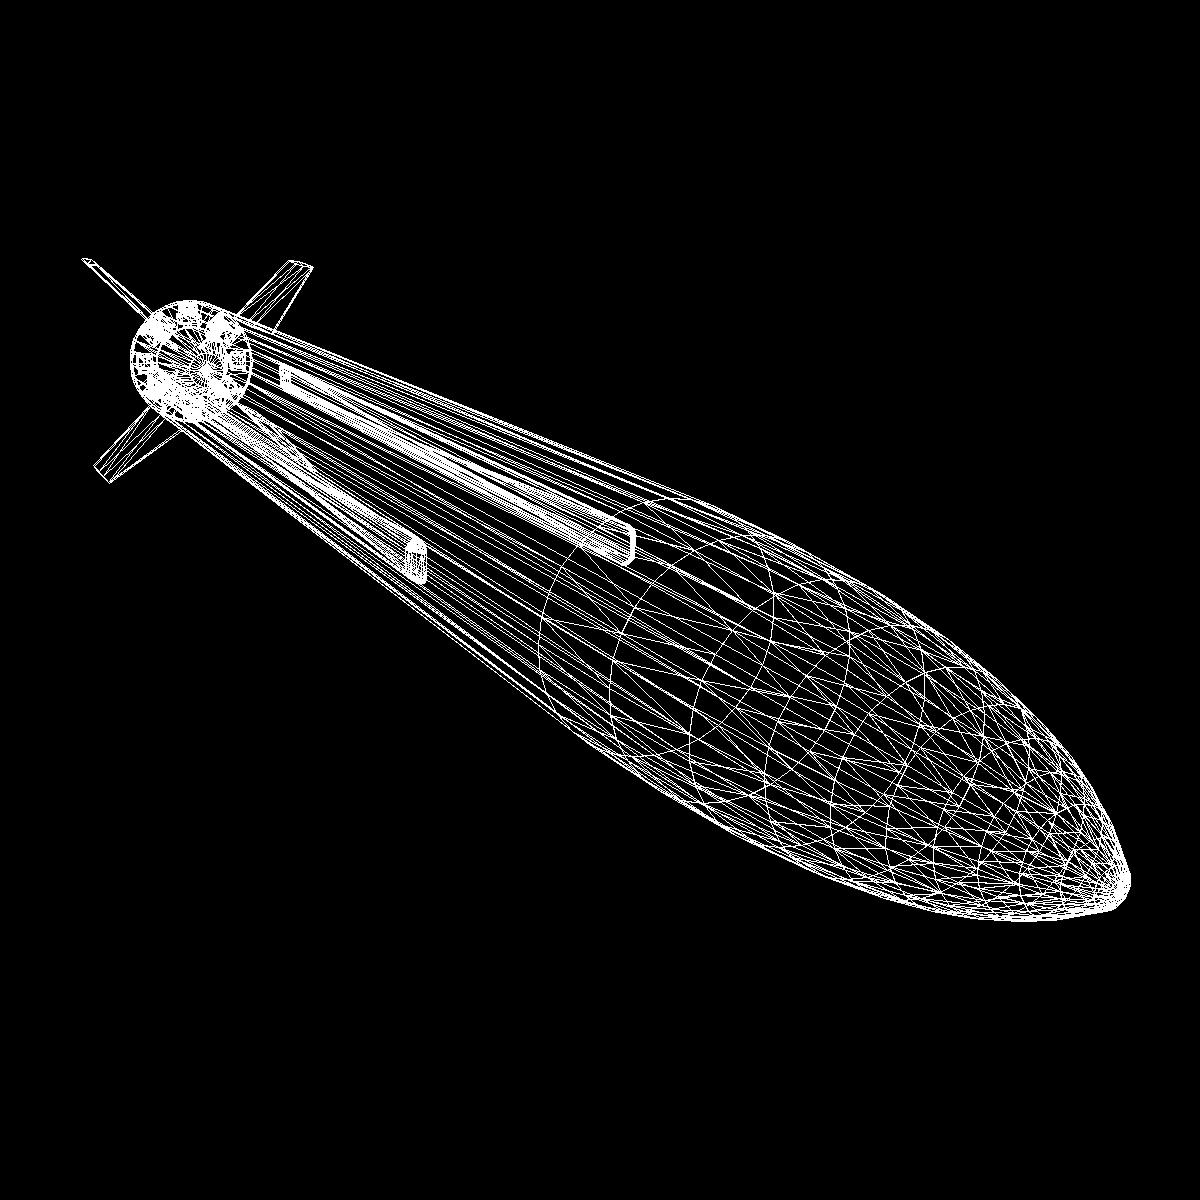 bp-12a missile 3d model 3ds dxf fbx blend cob dae x obj 217521